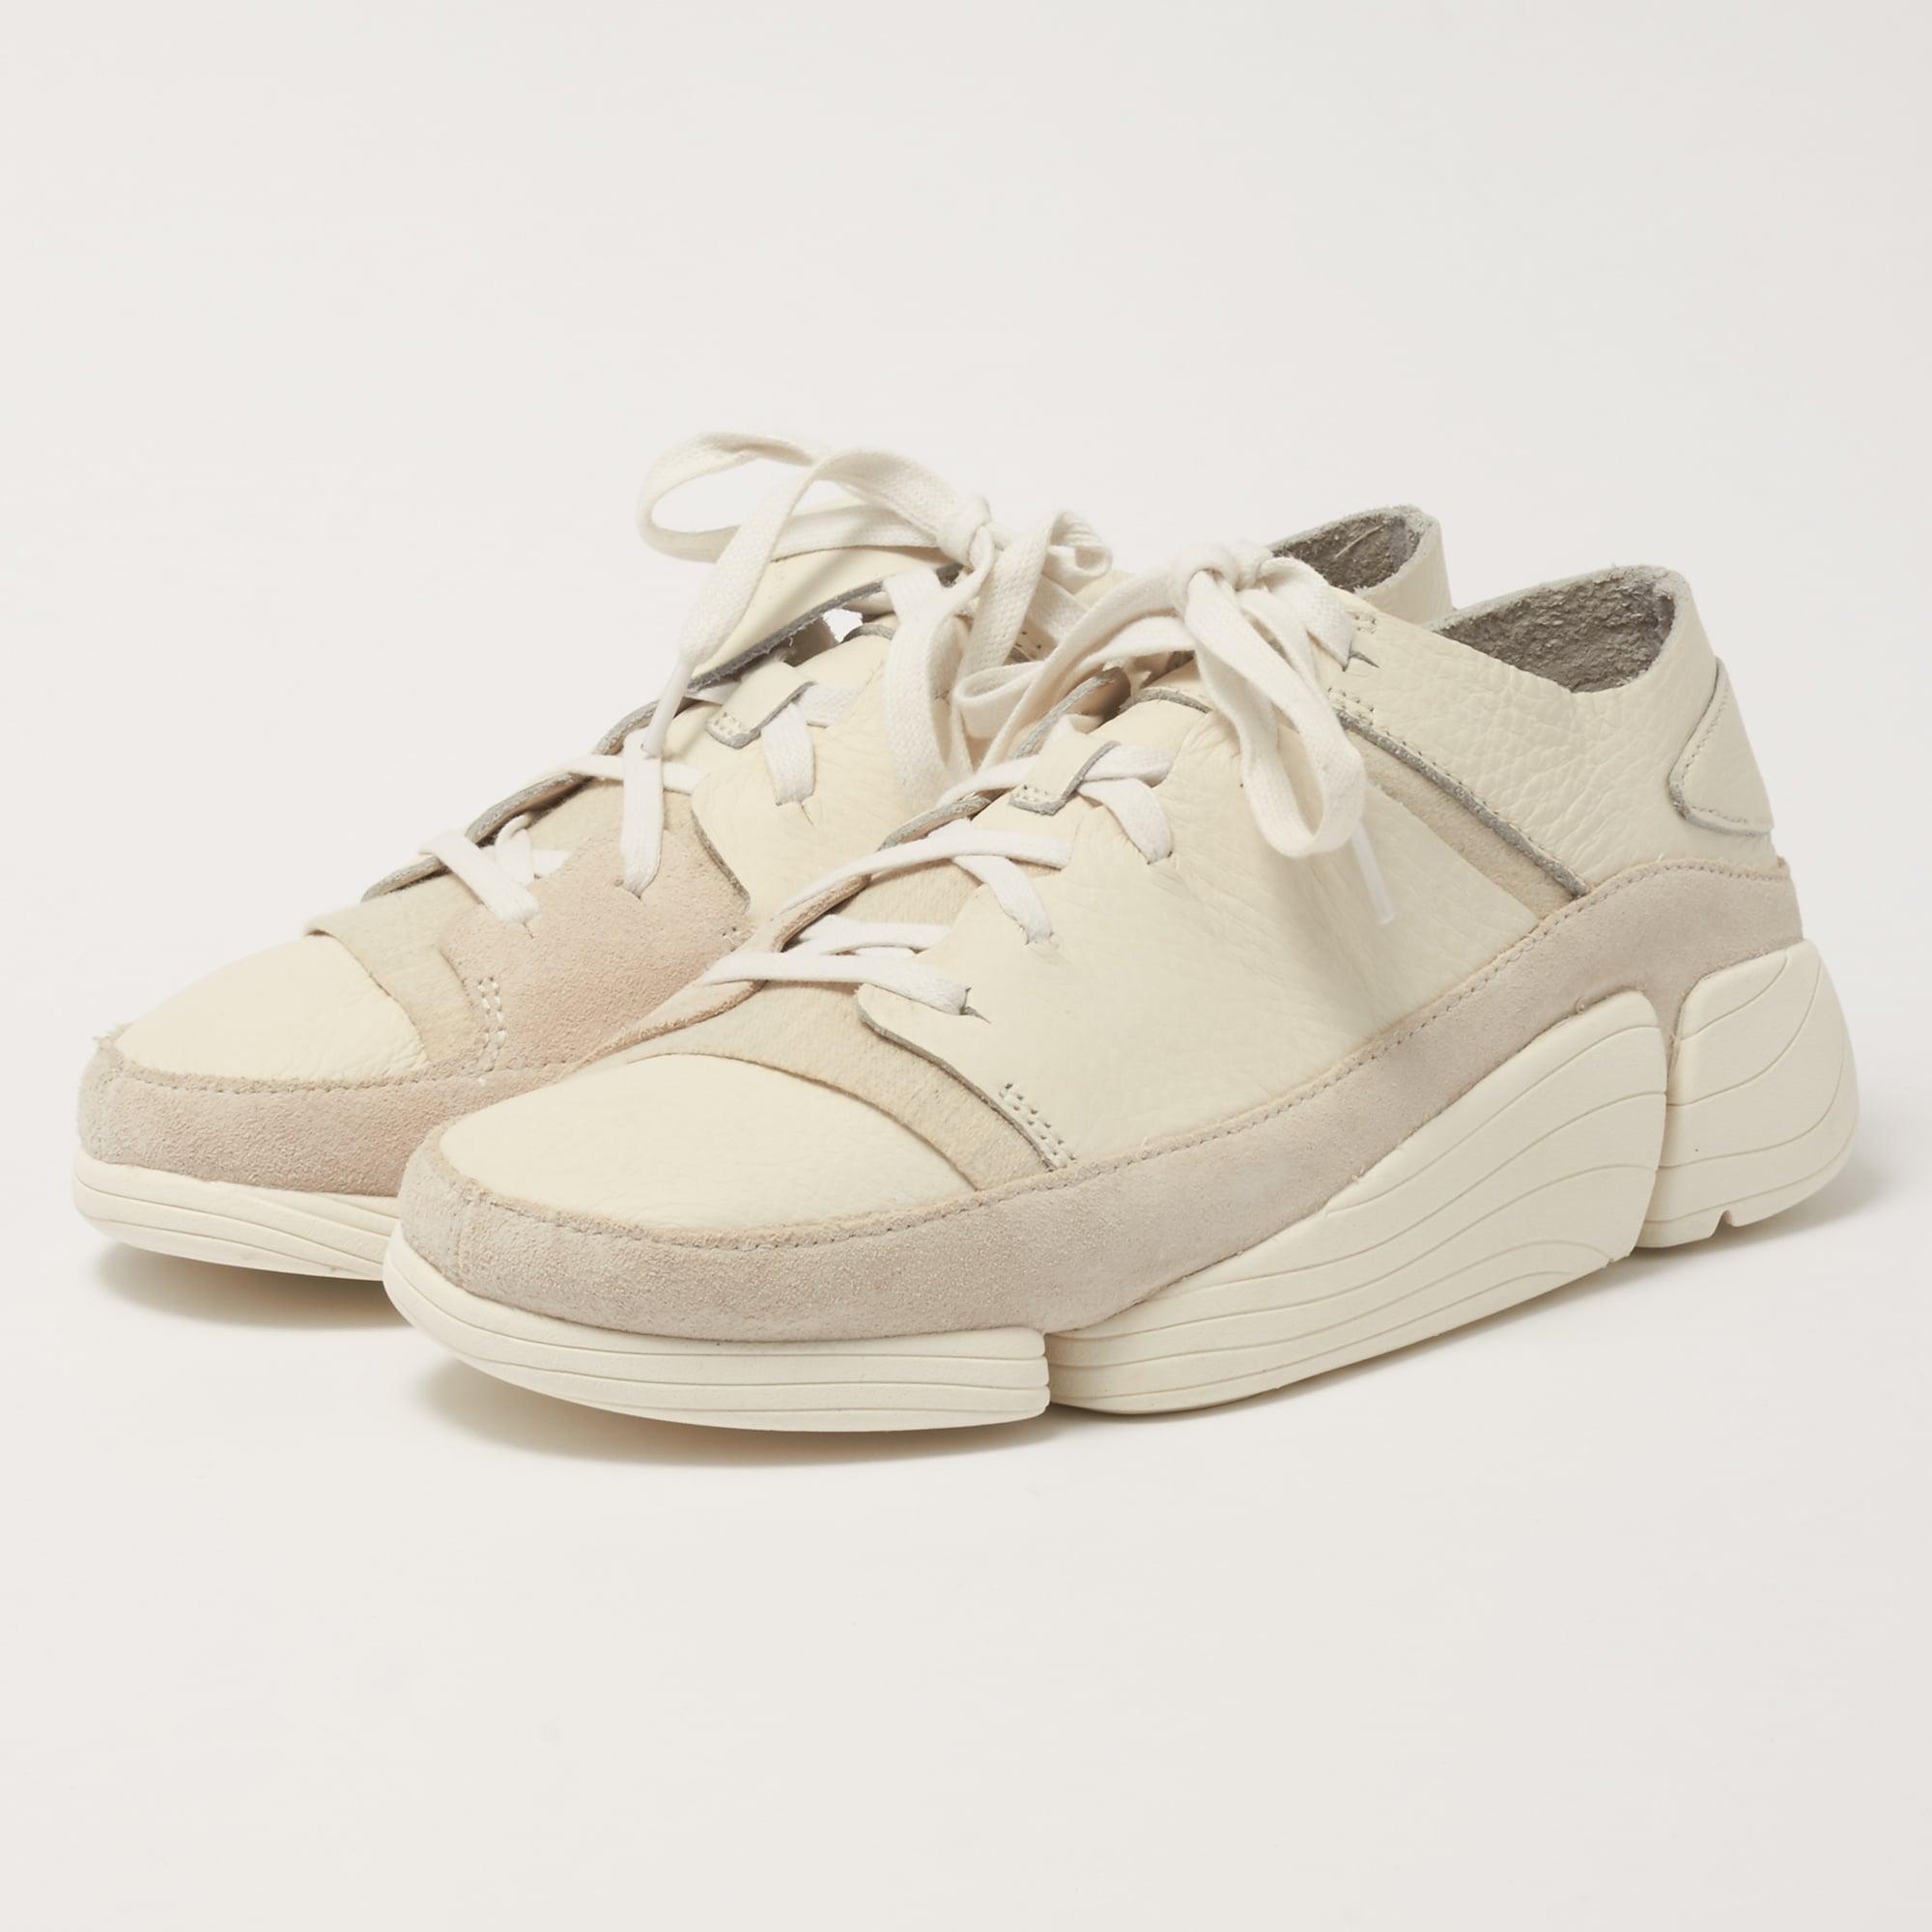 Clarks Originals Women's Trigenic Leather Trainers White